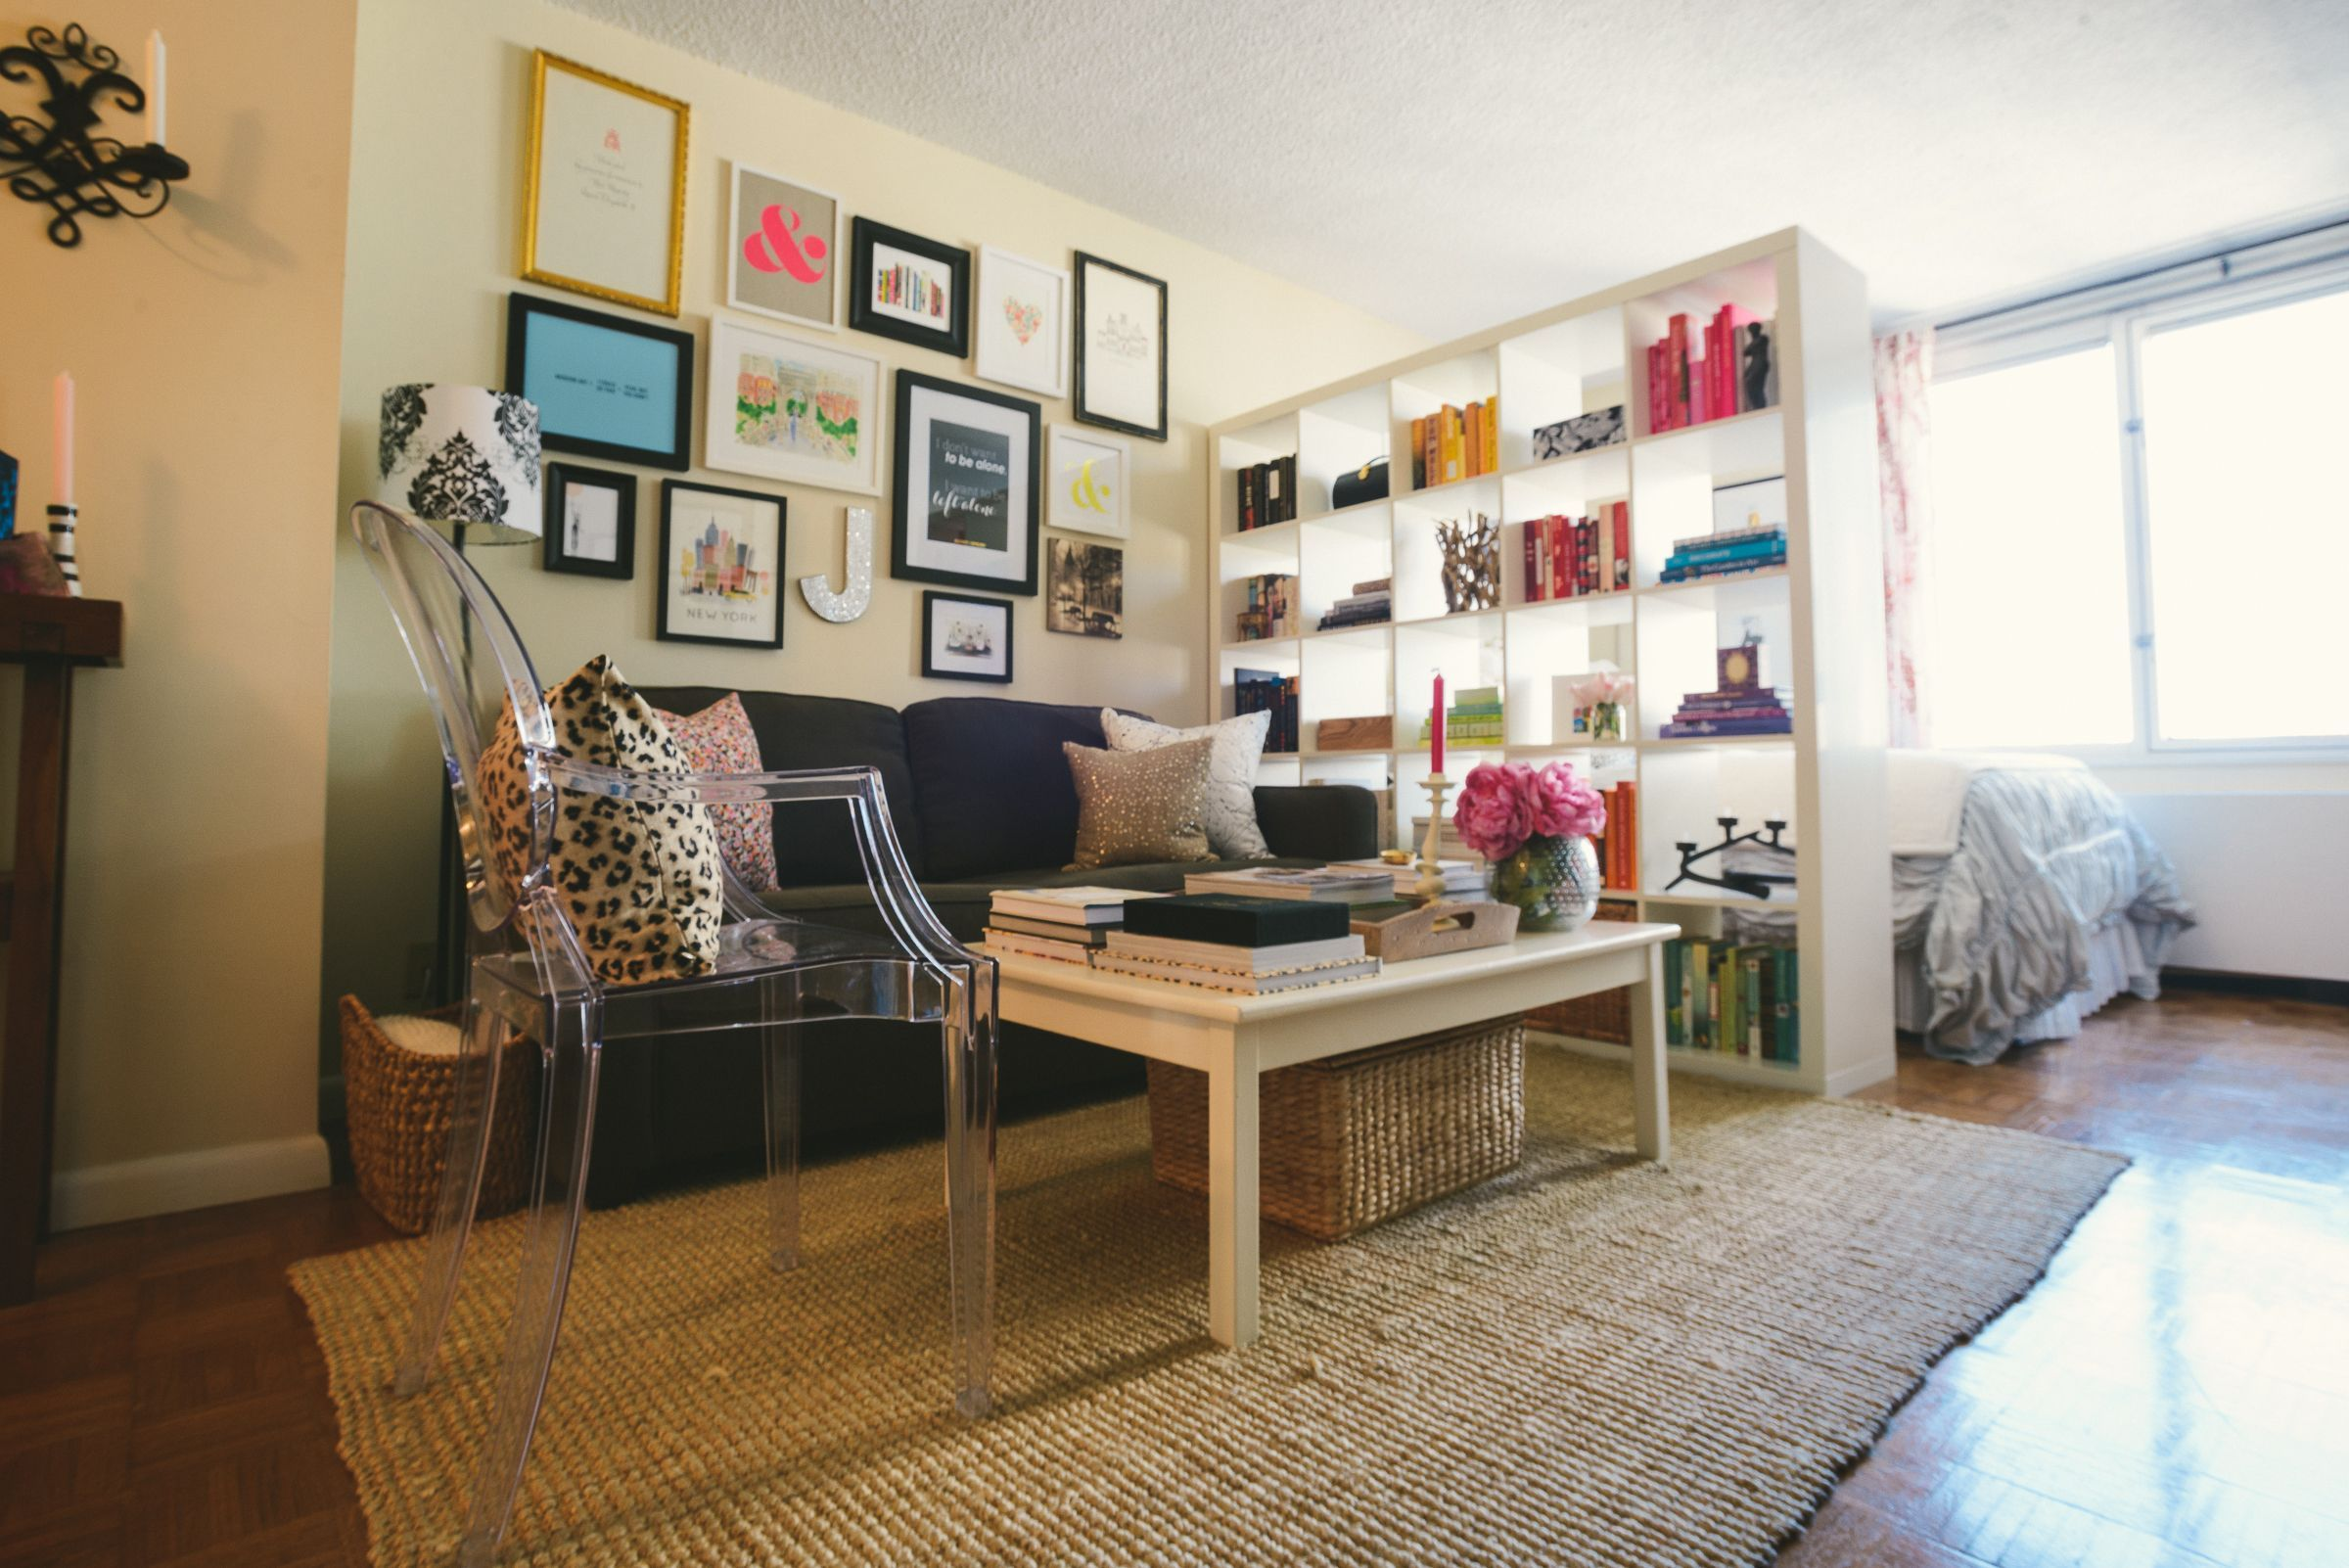 Jacqueline Clairs Nyc Studio Tour Home Decor #Studio